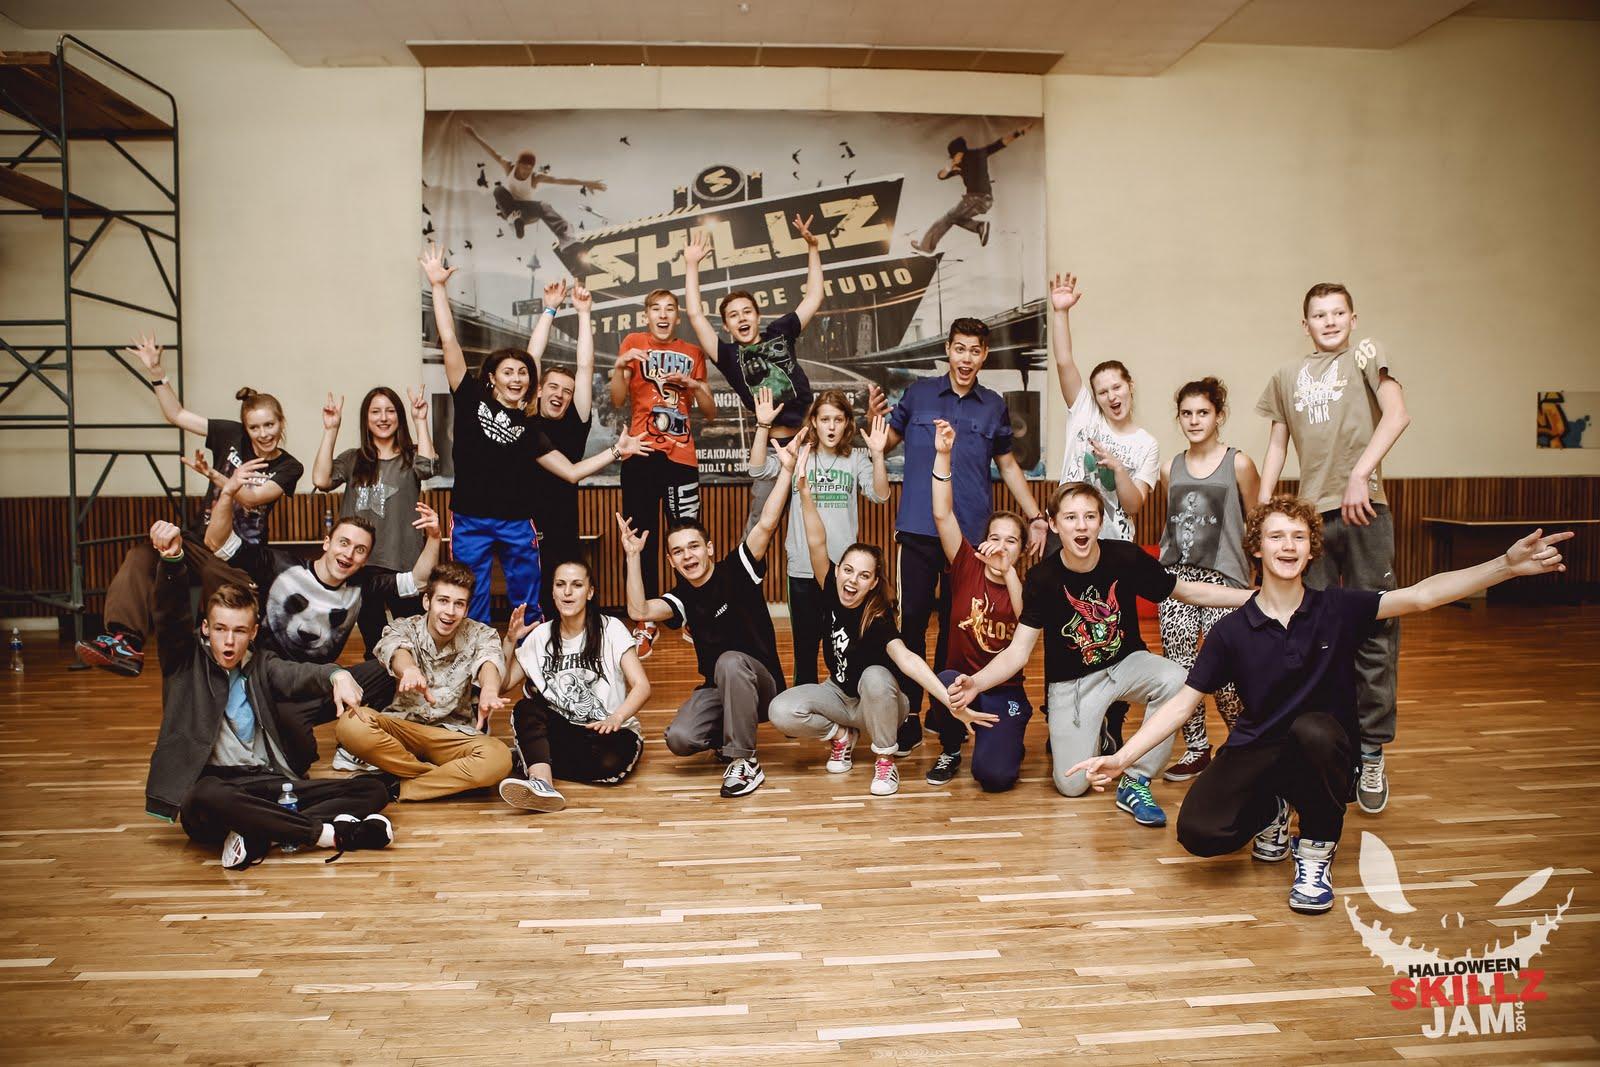 Šokių seminarai su Bouboo, Kaczorex, Tanya, Marek - _MG_7444.jpg